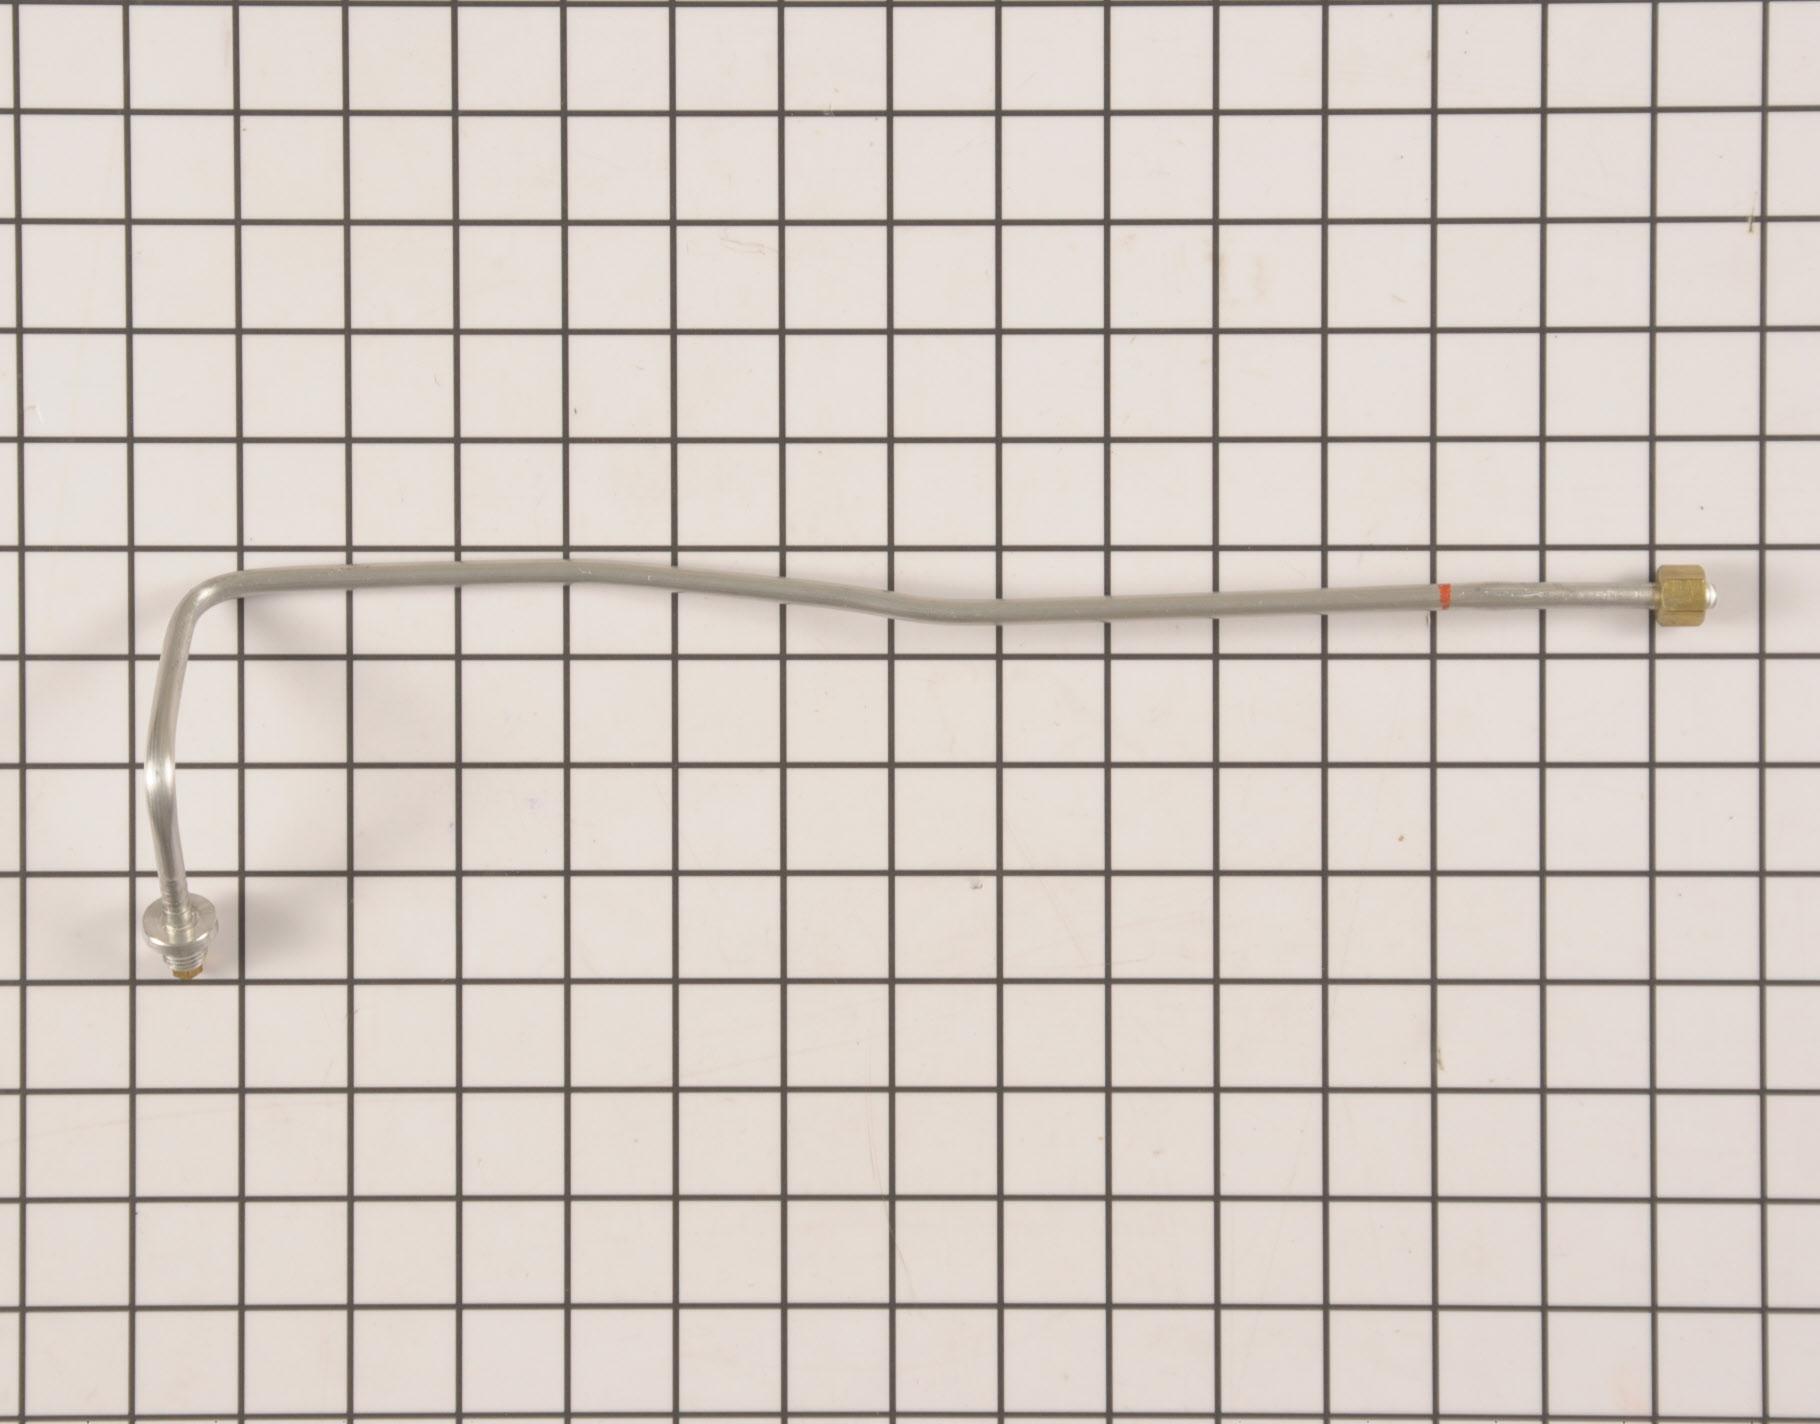 Whirlpool Range/Stove/Oven Part # WP98017359 - Surface Burner Orifice Holder